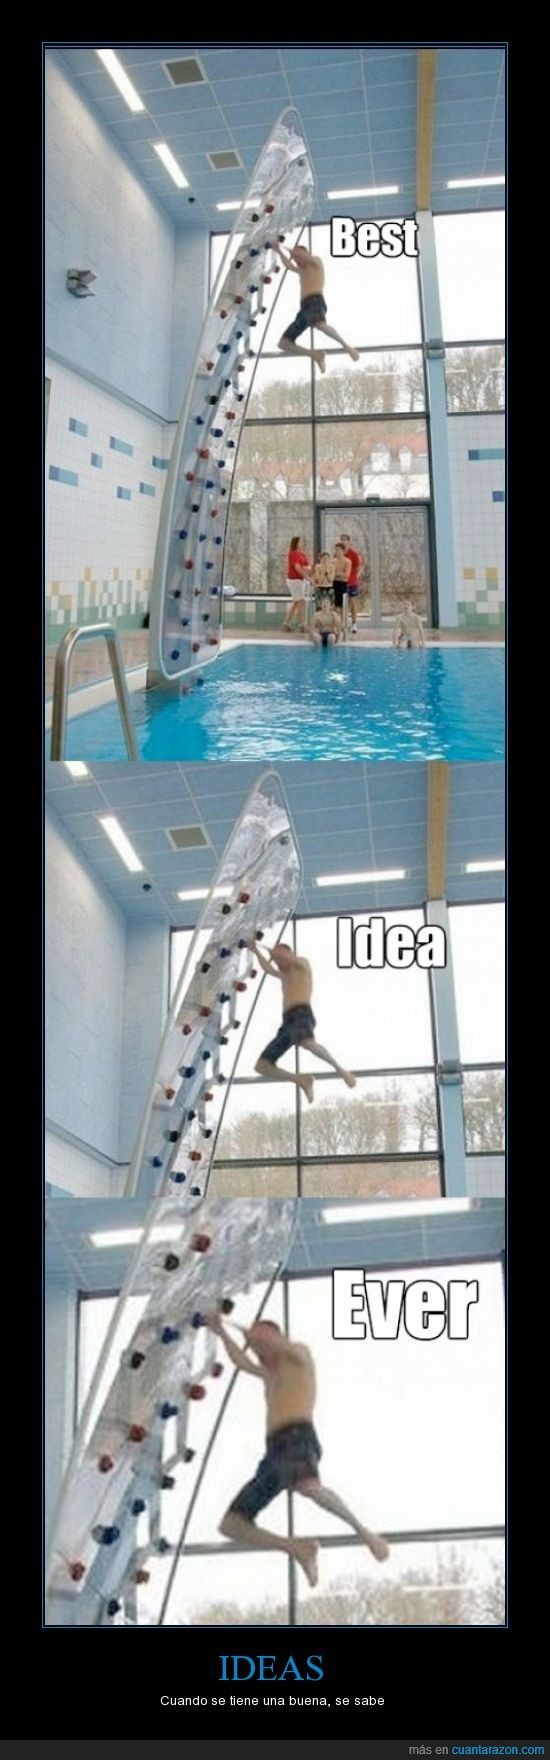 epicas,ideas,nadador,pared de escalada,piscina,saltar